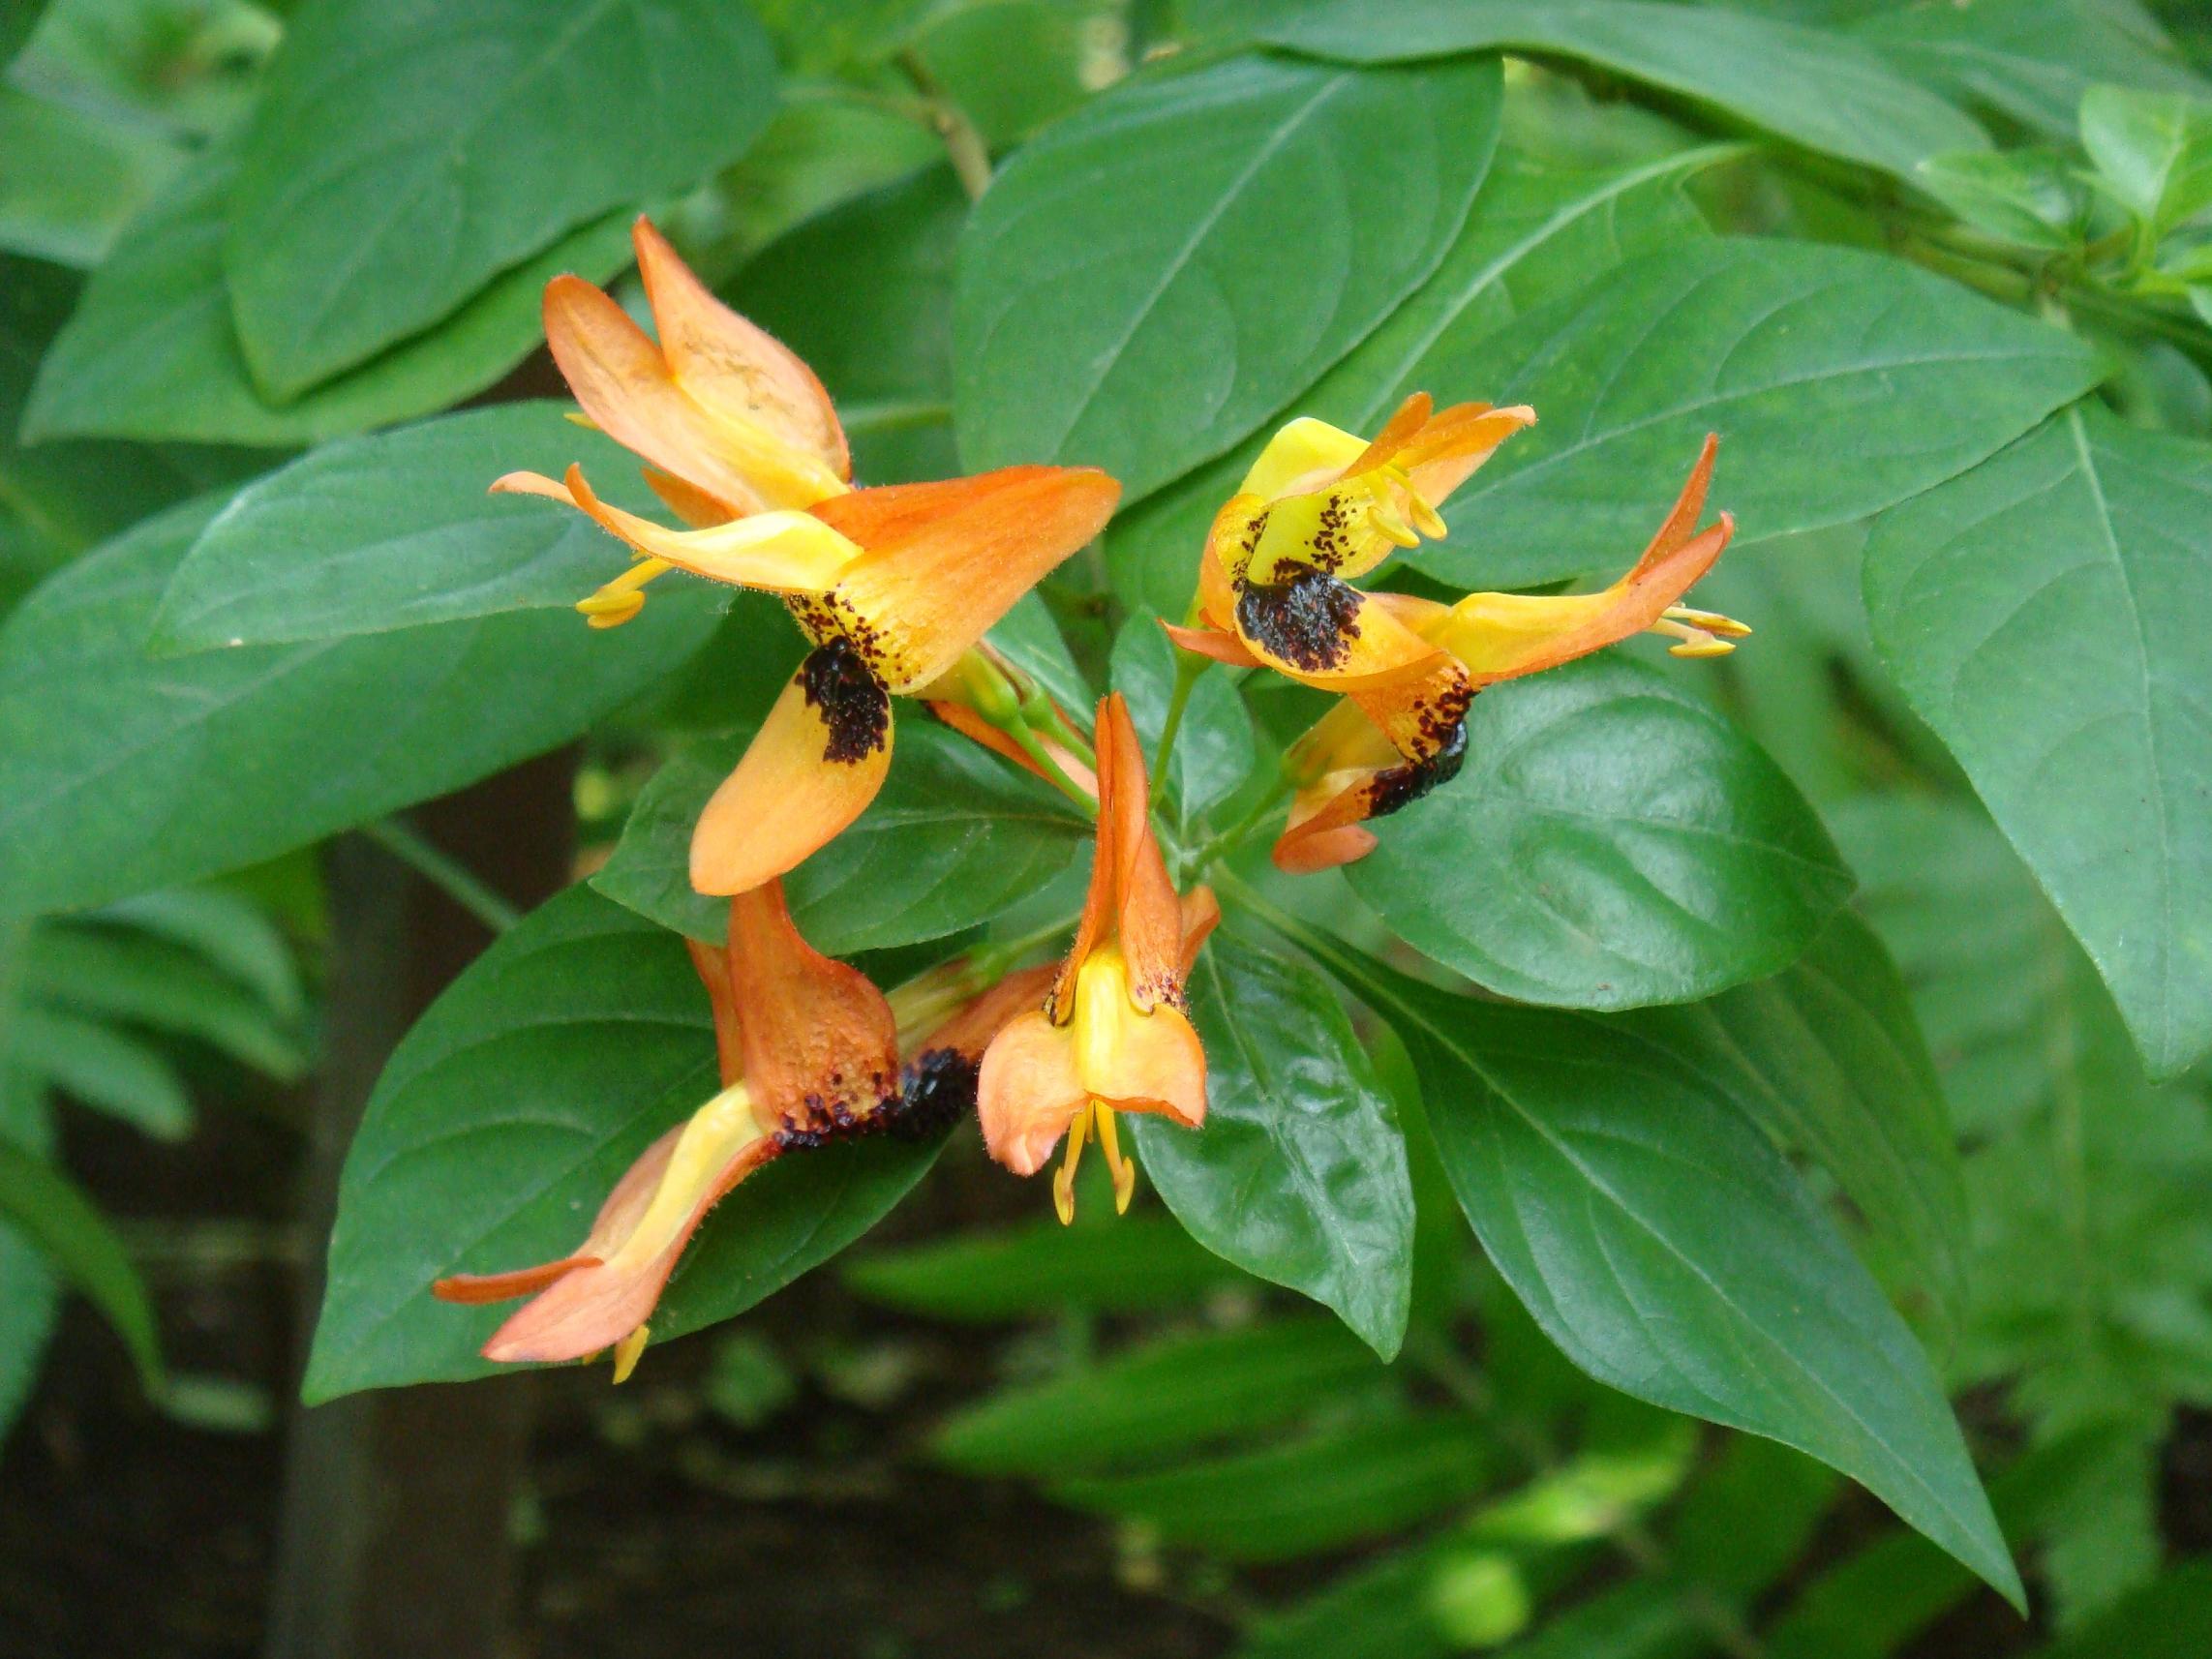 Ruttya fruticosa Lindau